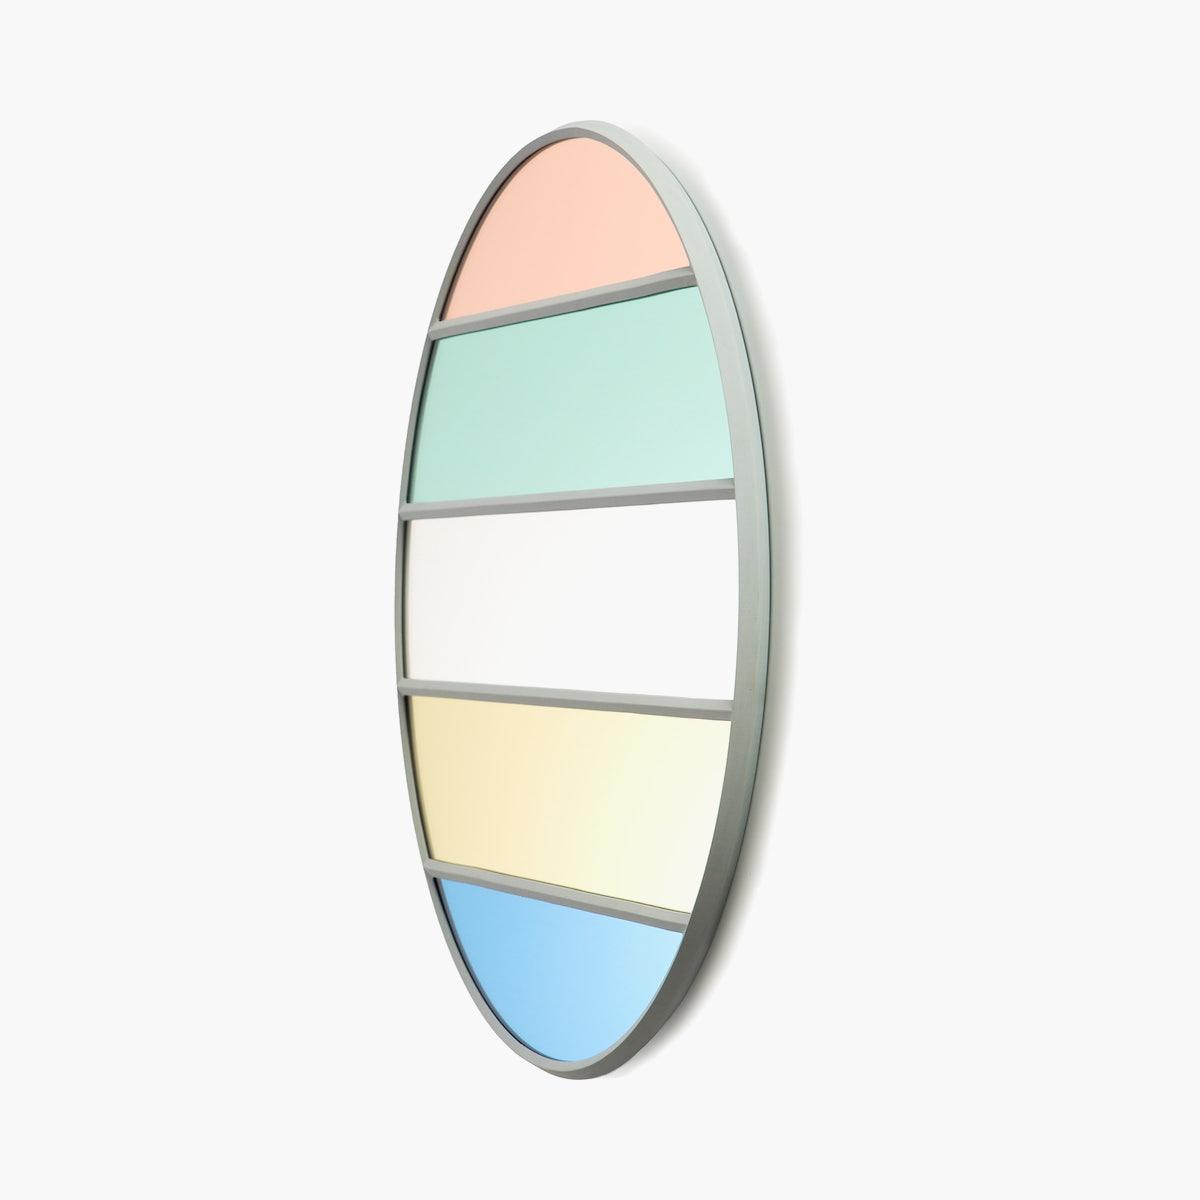 Vitrail Mirror